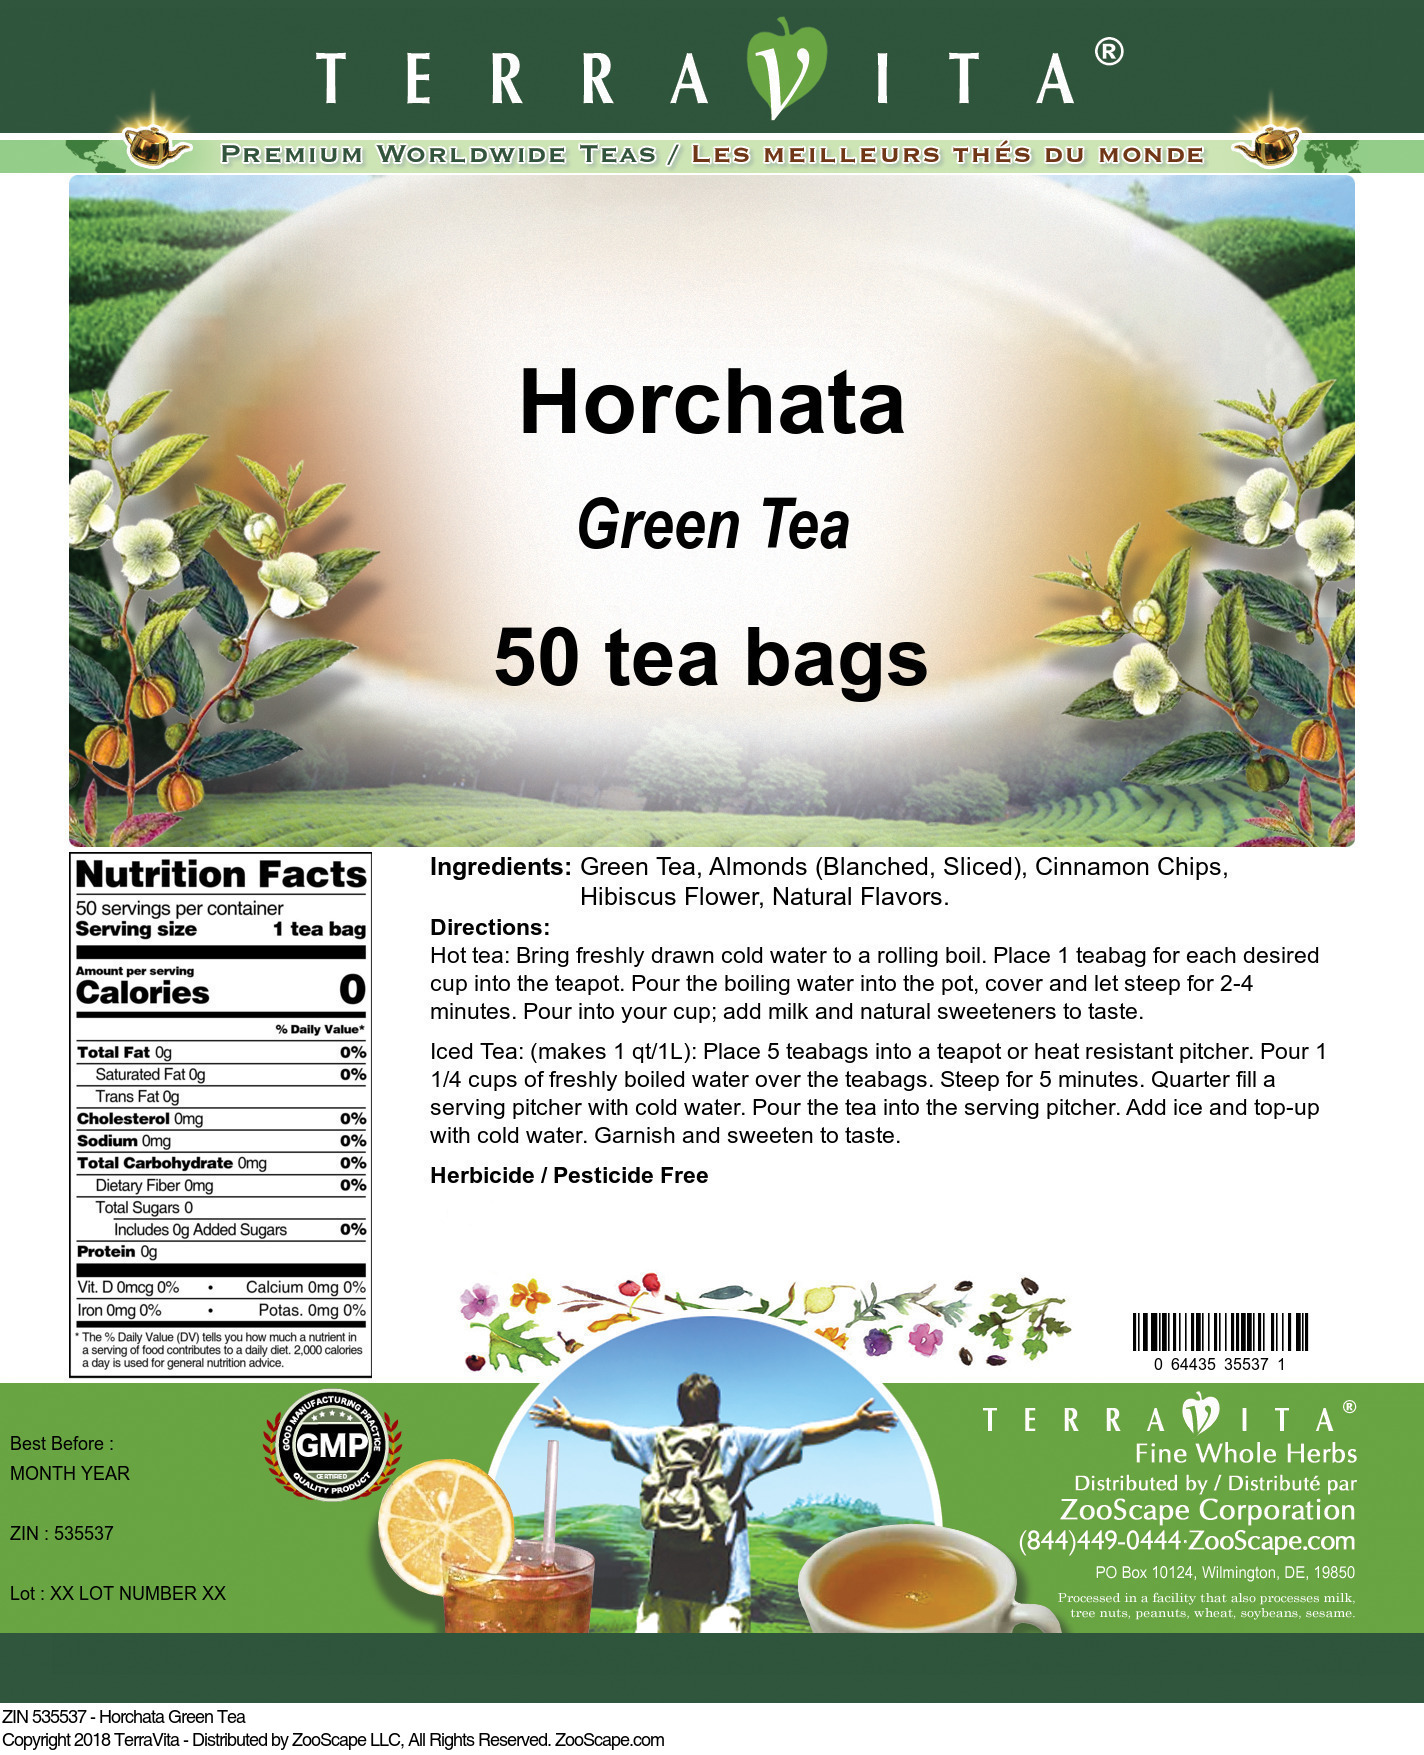 Horchata Green Tea